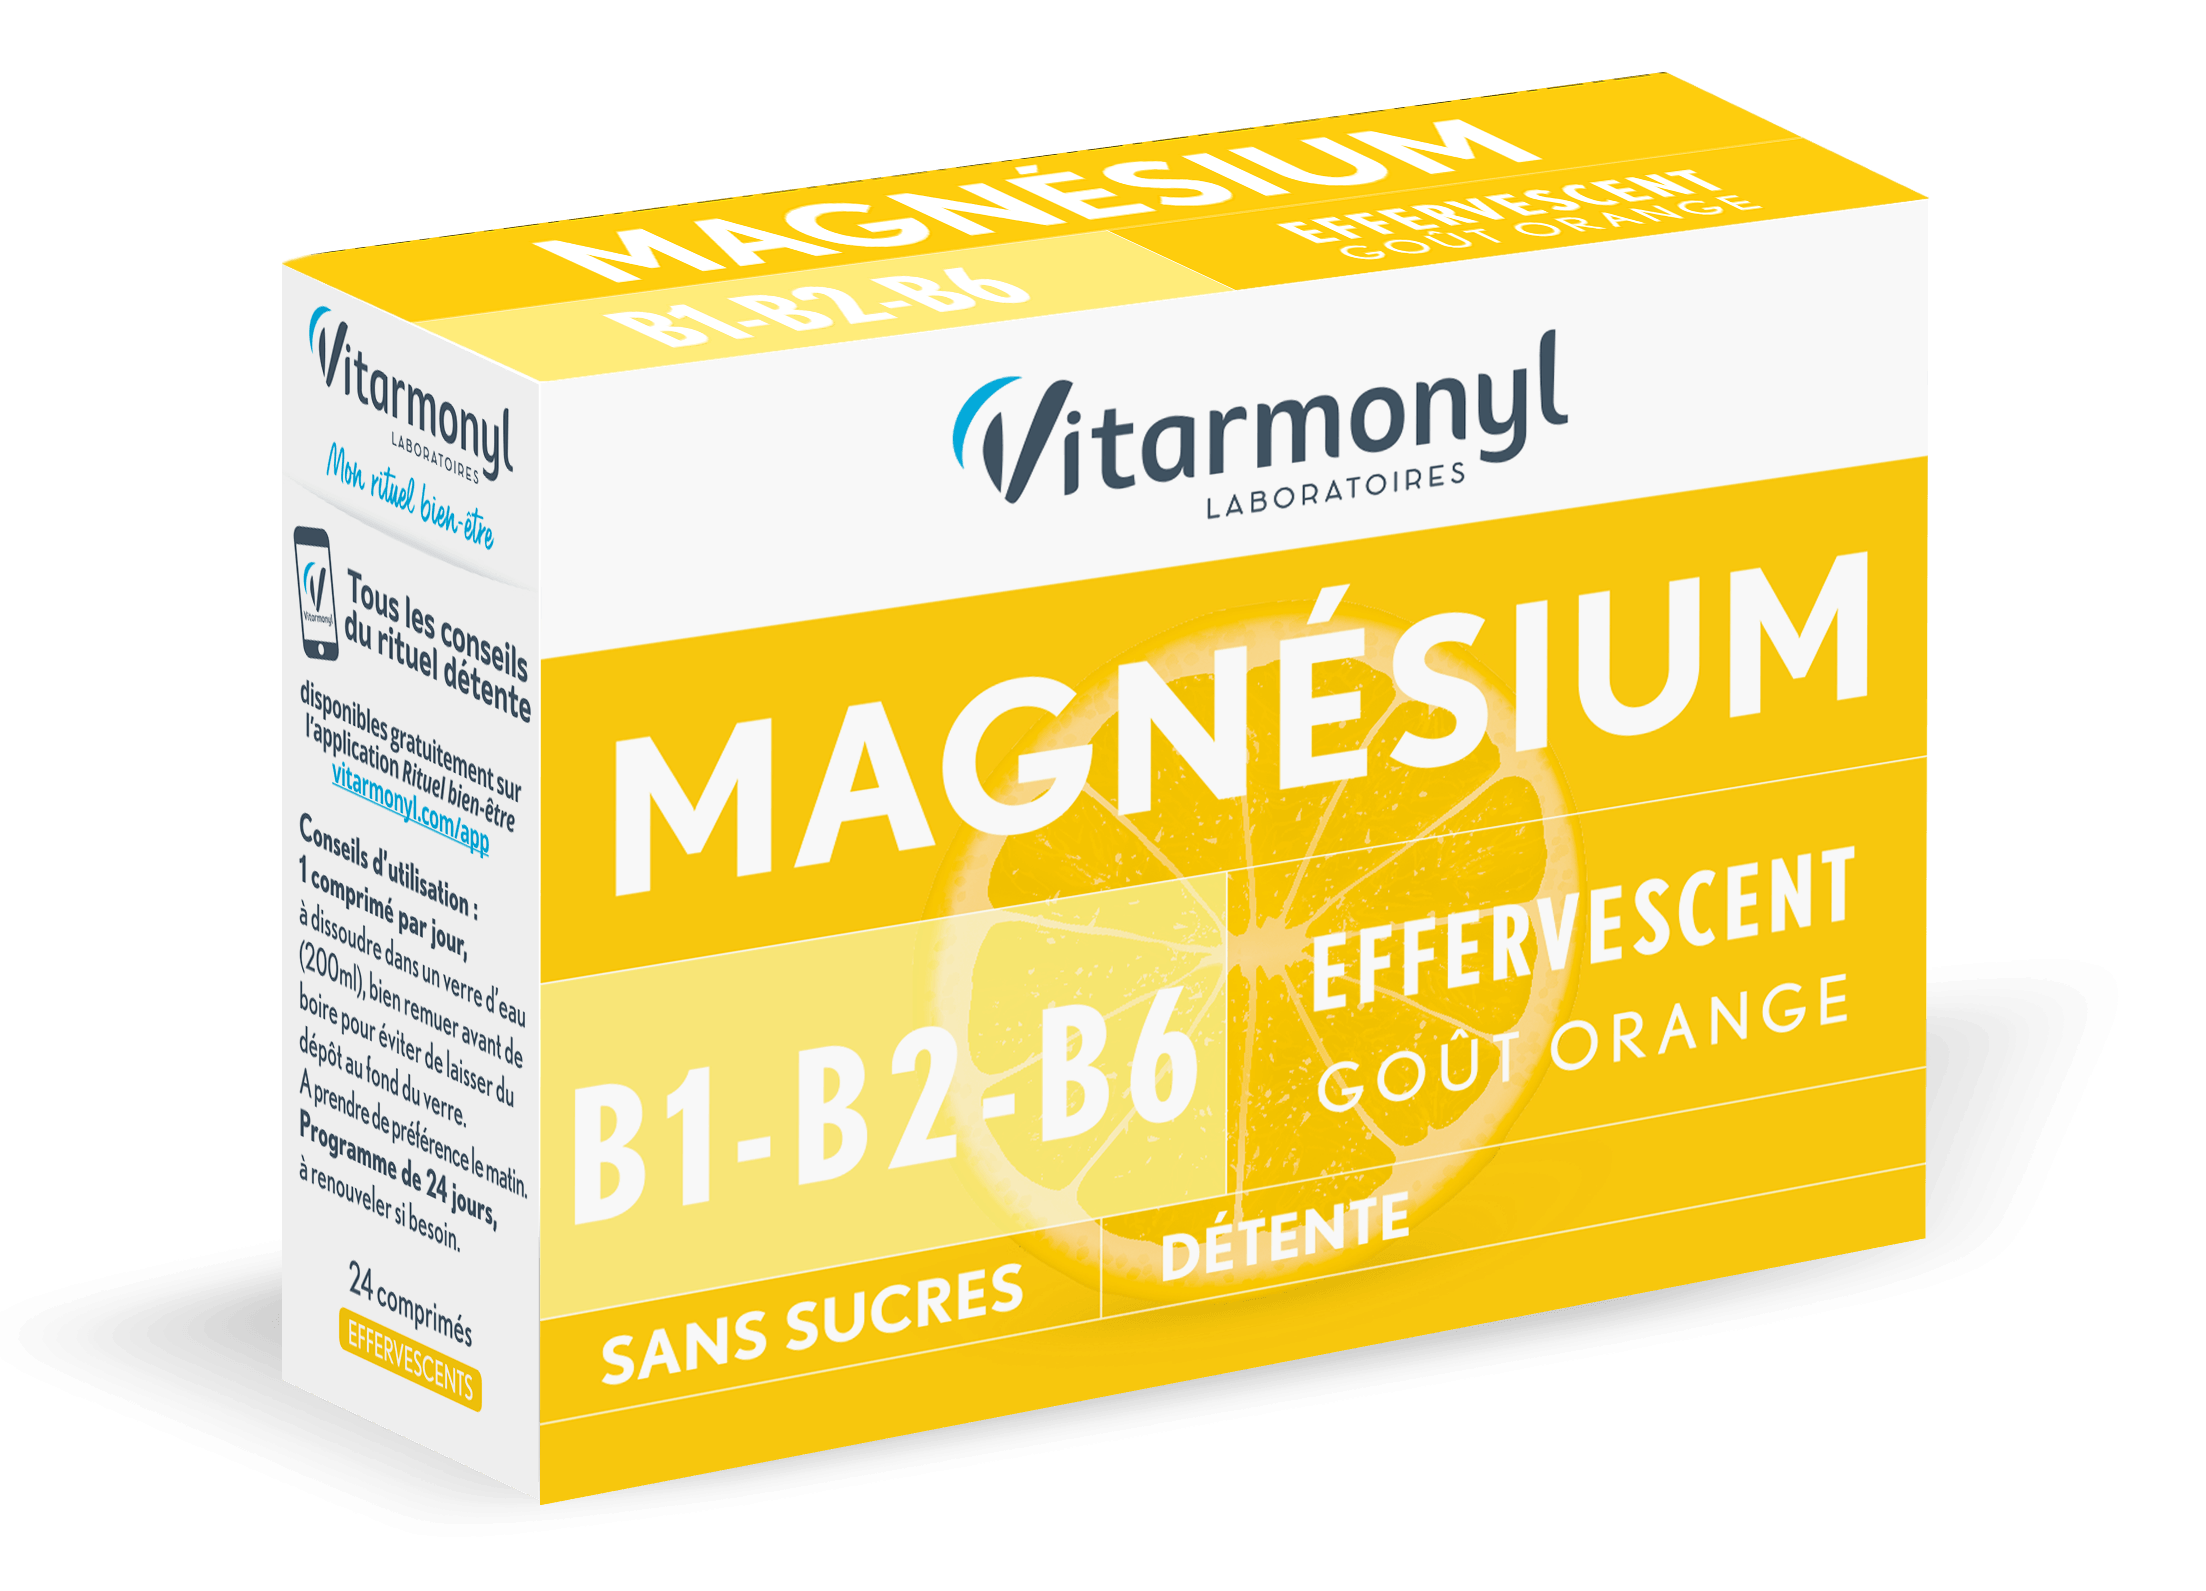 Image Magnésium + B1, B2, B6